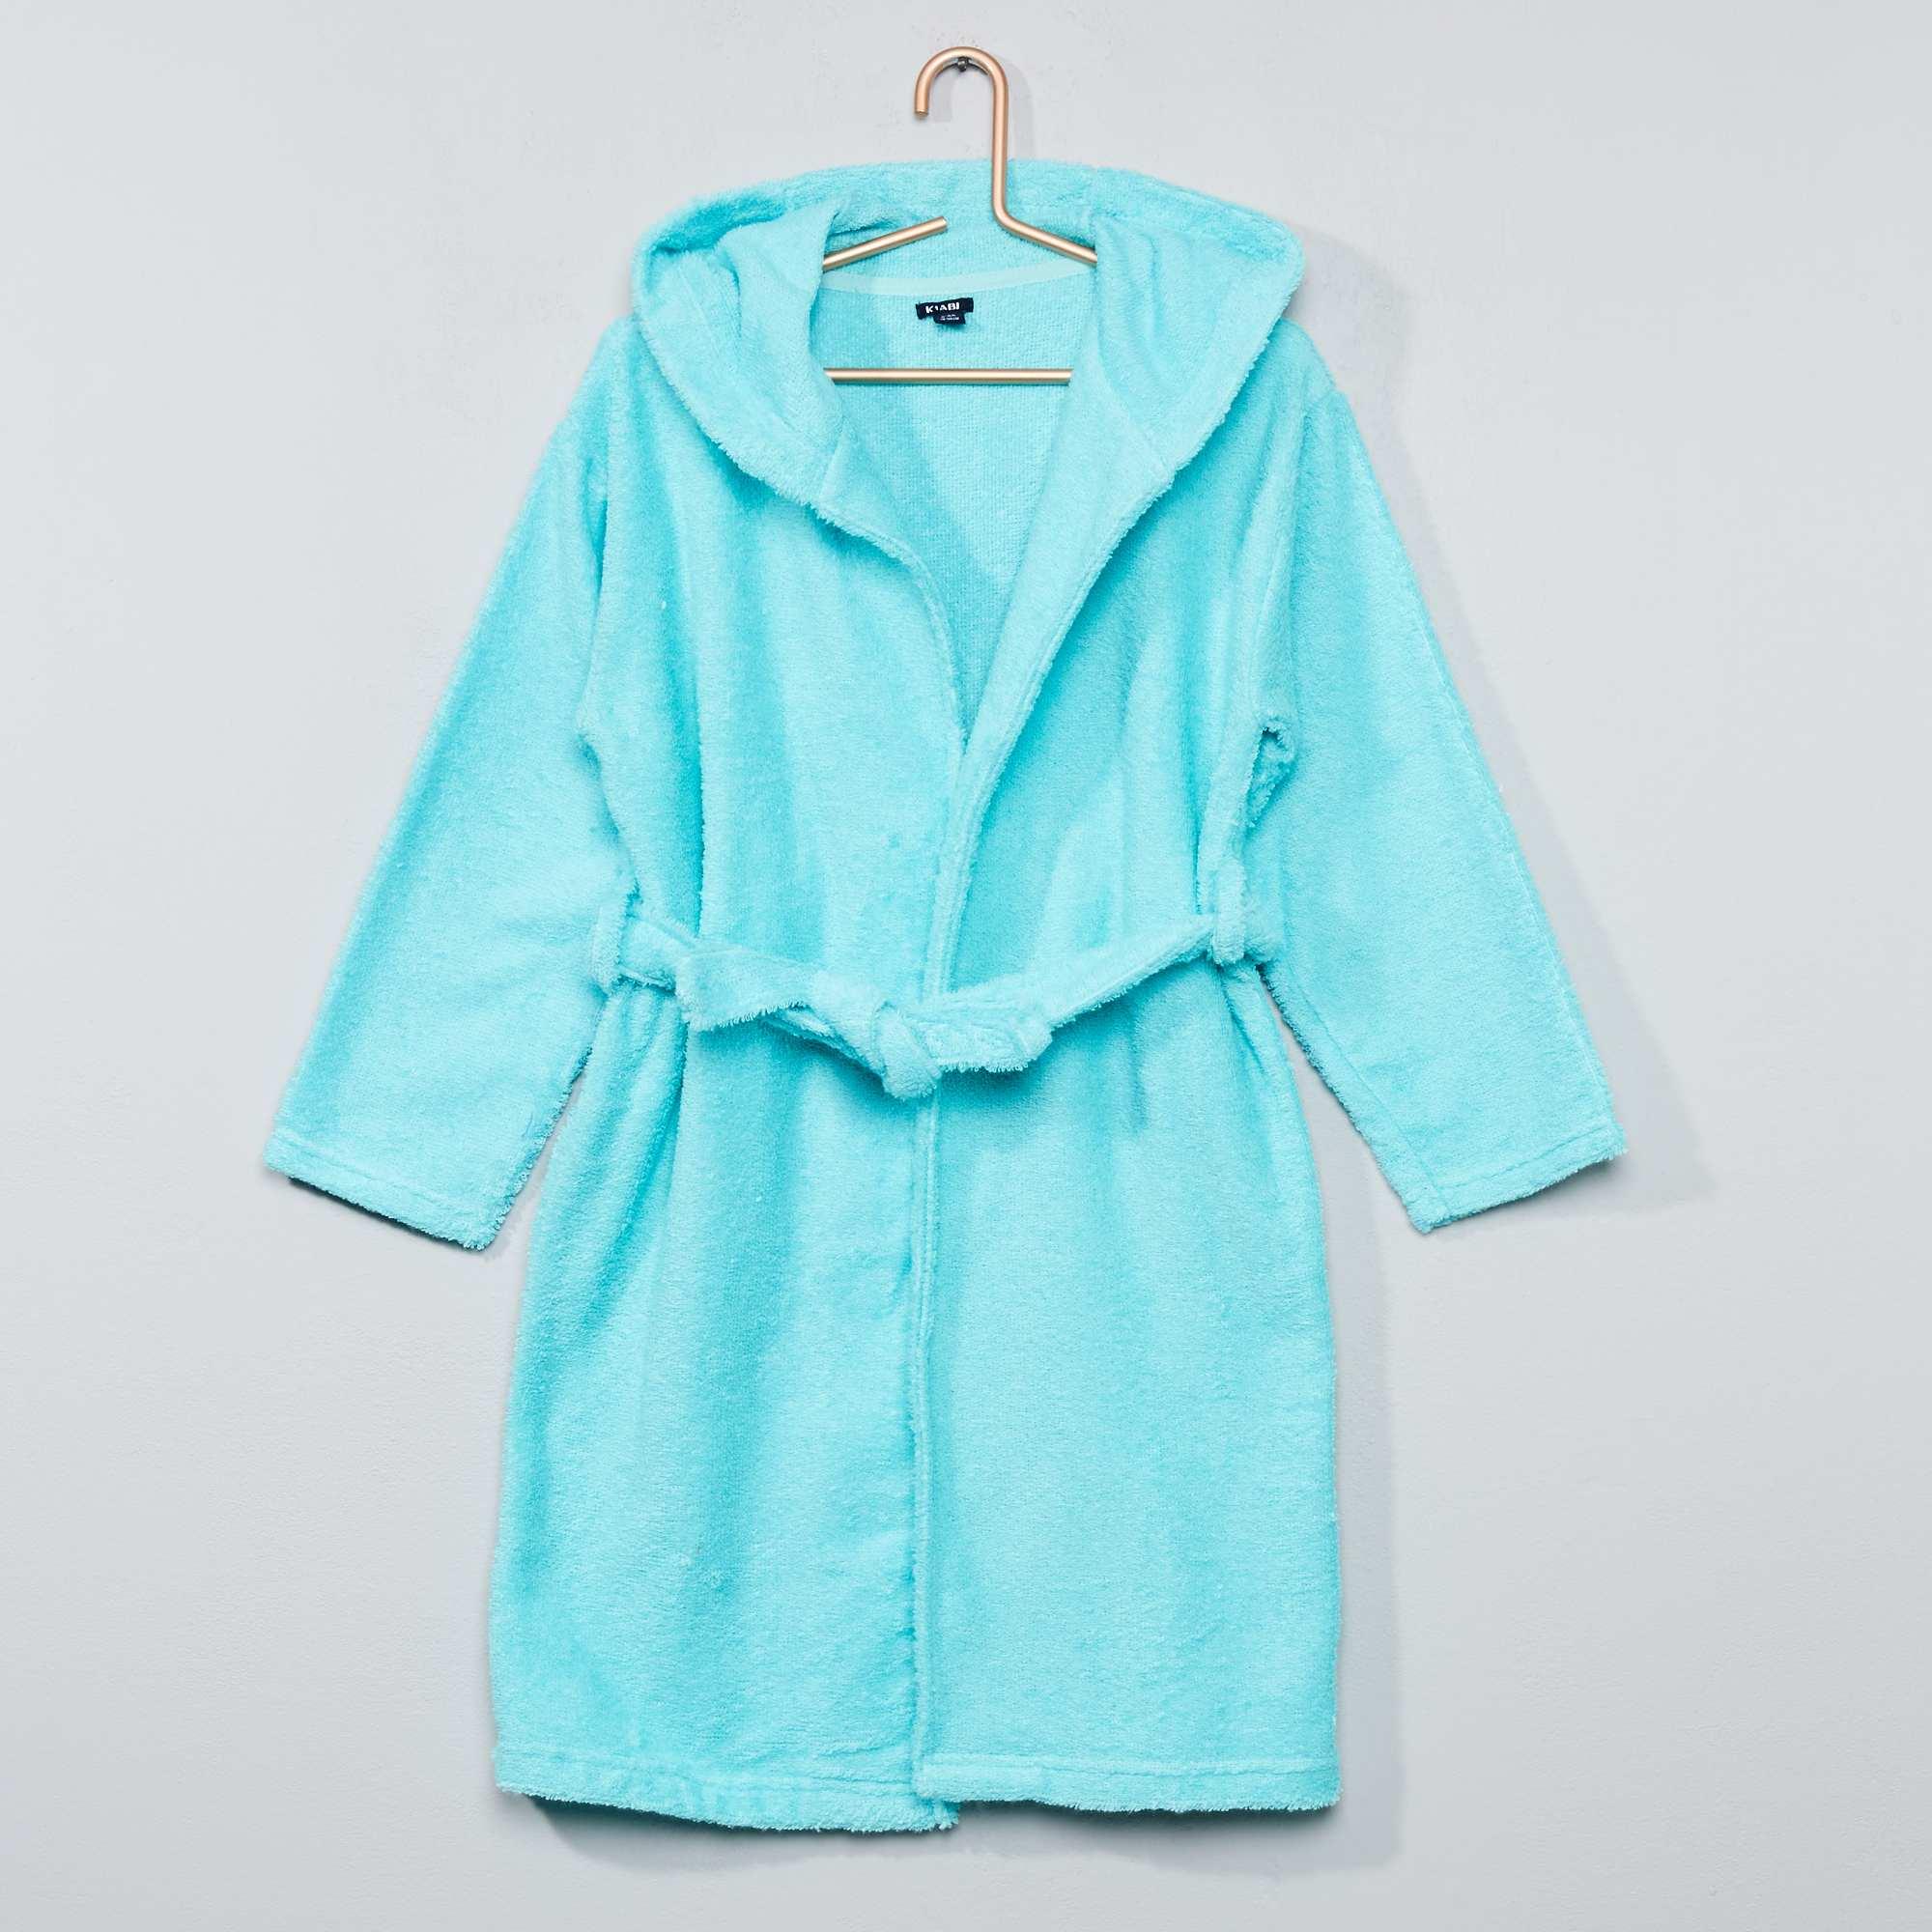 peignoir capuche en ponge fille bleu kiabi 15 00. Black Bedroom Furniture Sets. Home Design Ideas